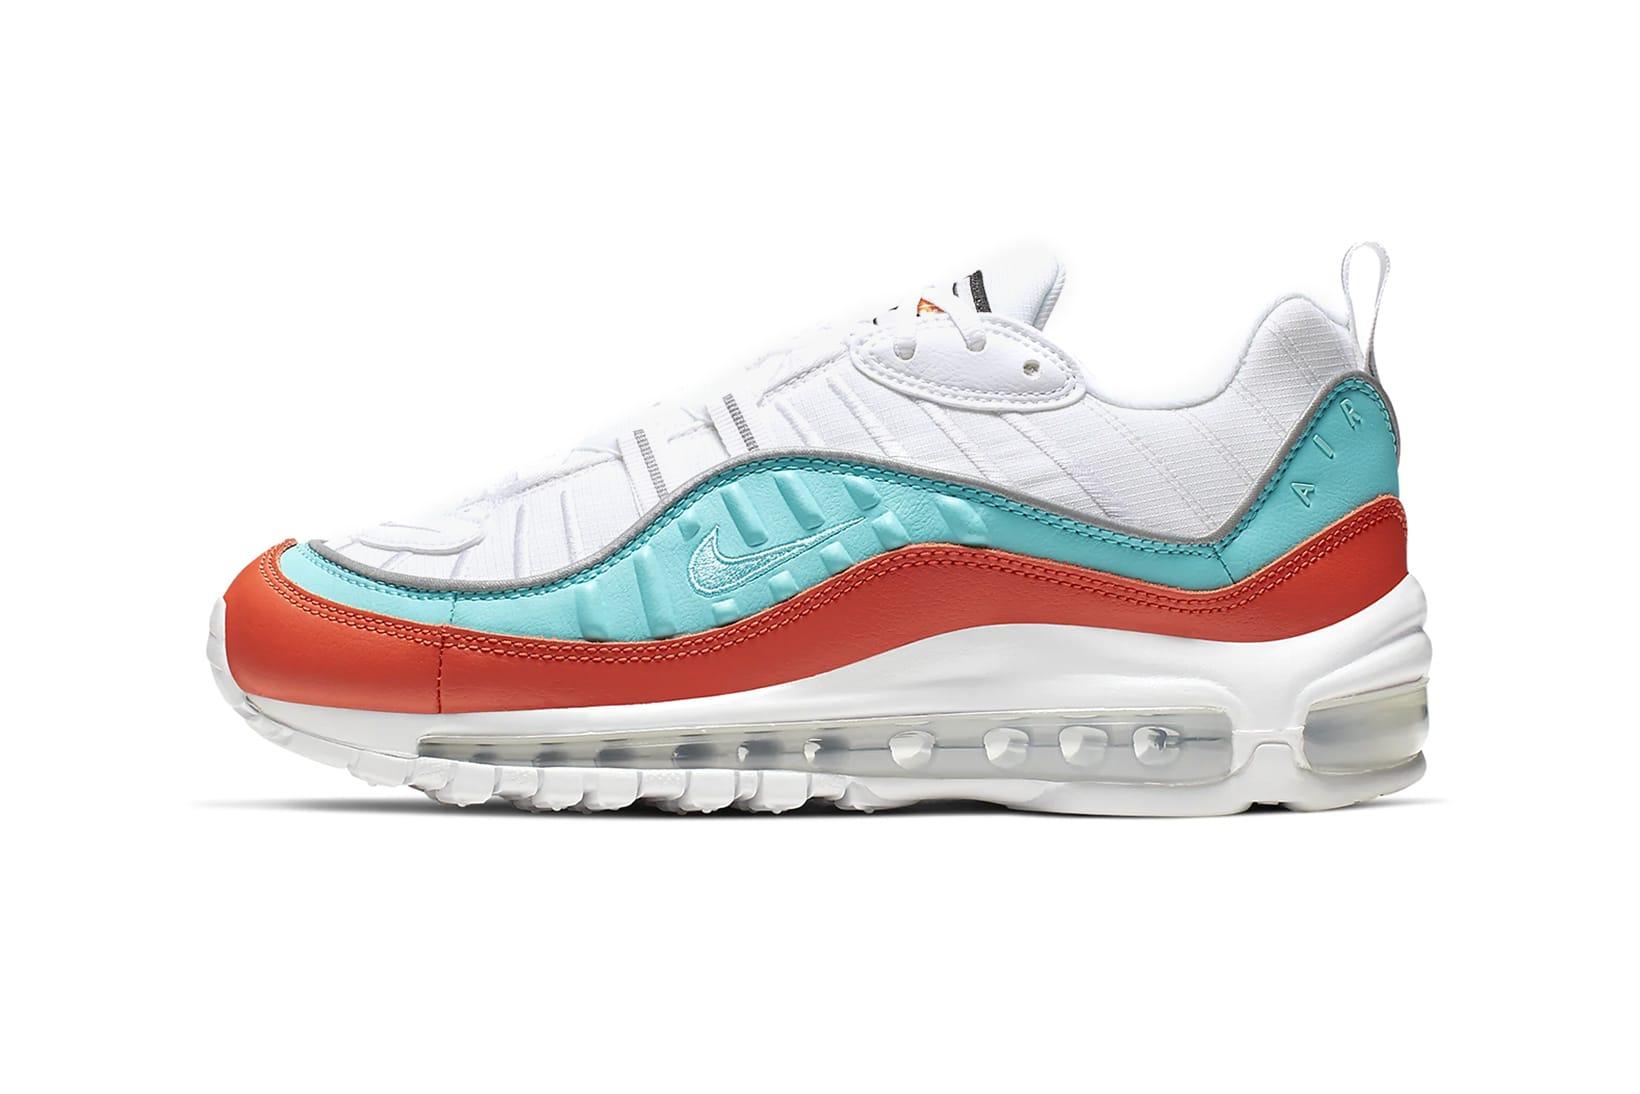 Nike's Air Max 98 SE in \